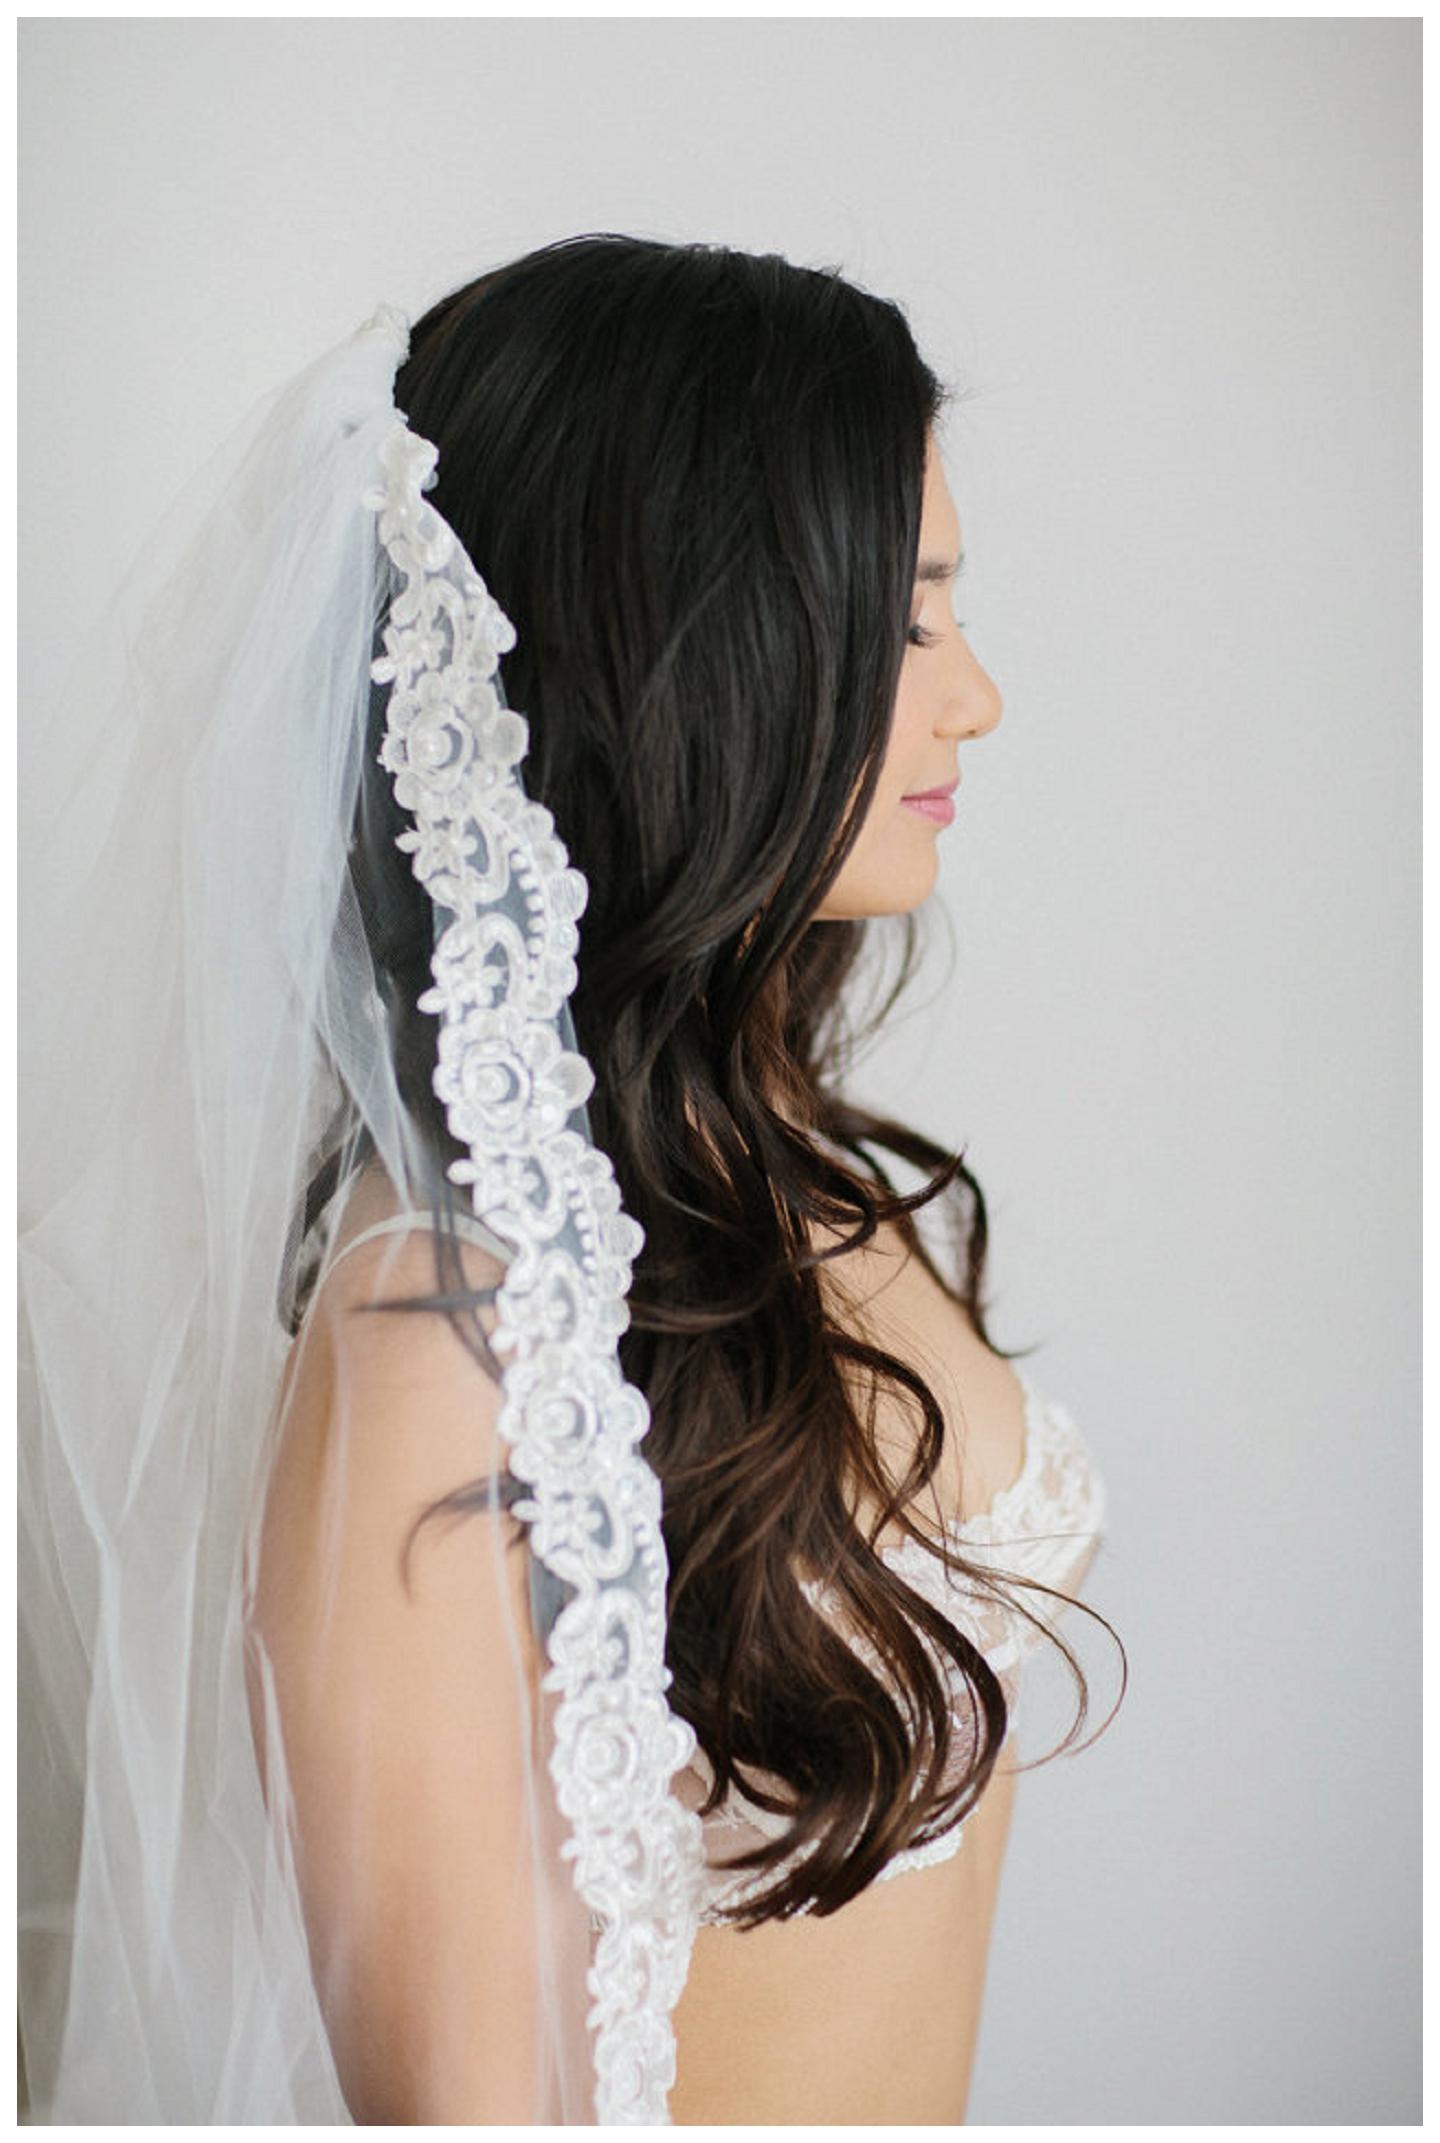 California Bridal Boudoir Session Miss C Retrospect Images